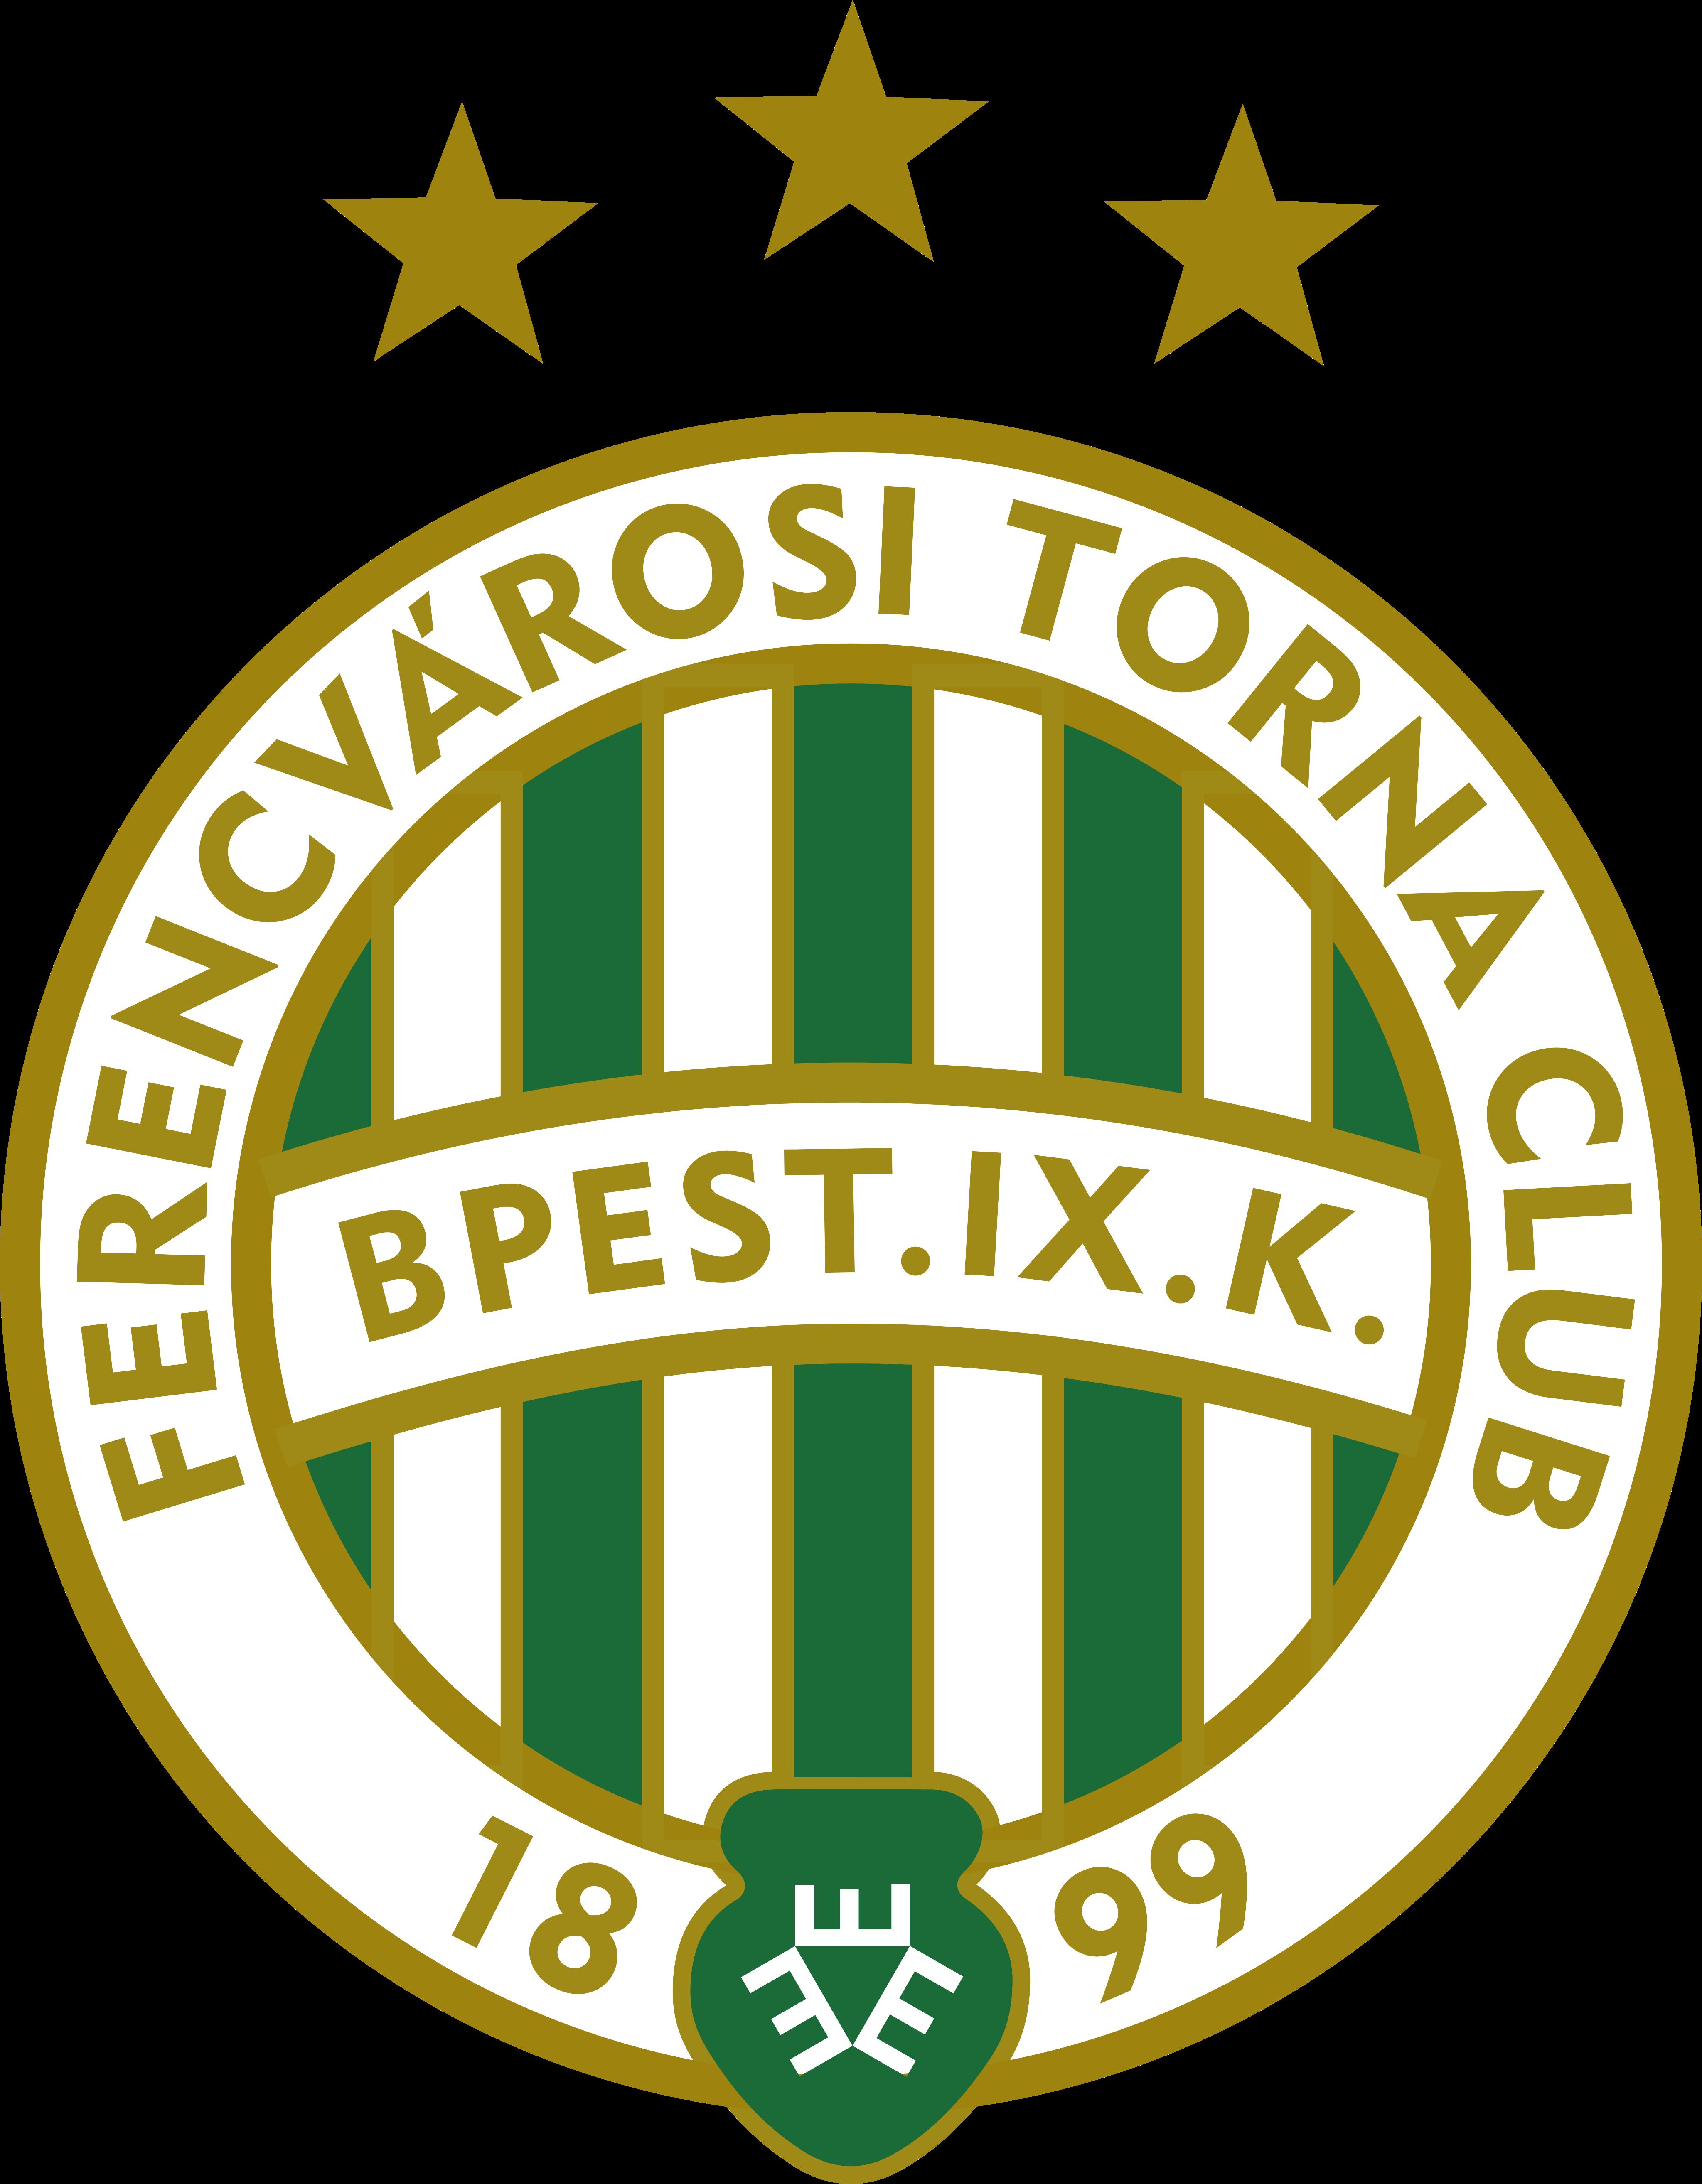 Ferencvárosi Torna Club Logo.